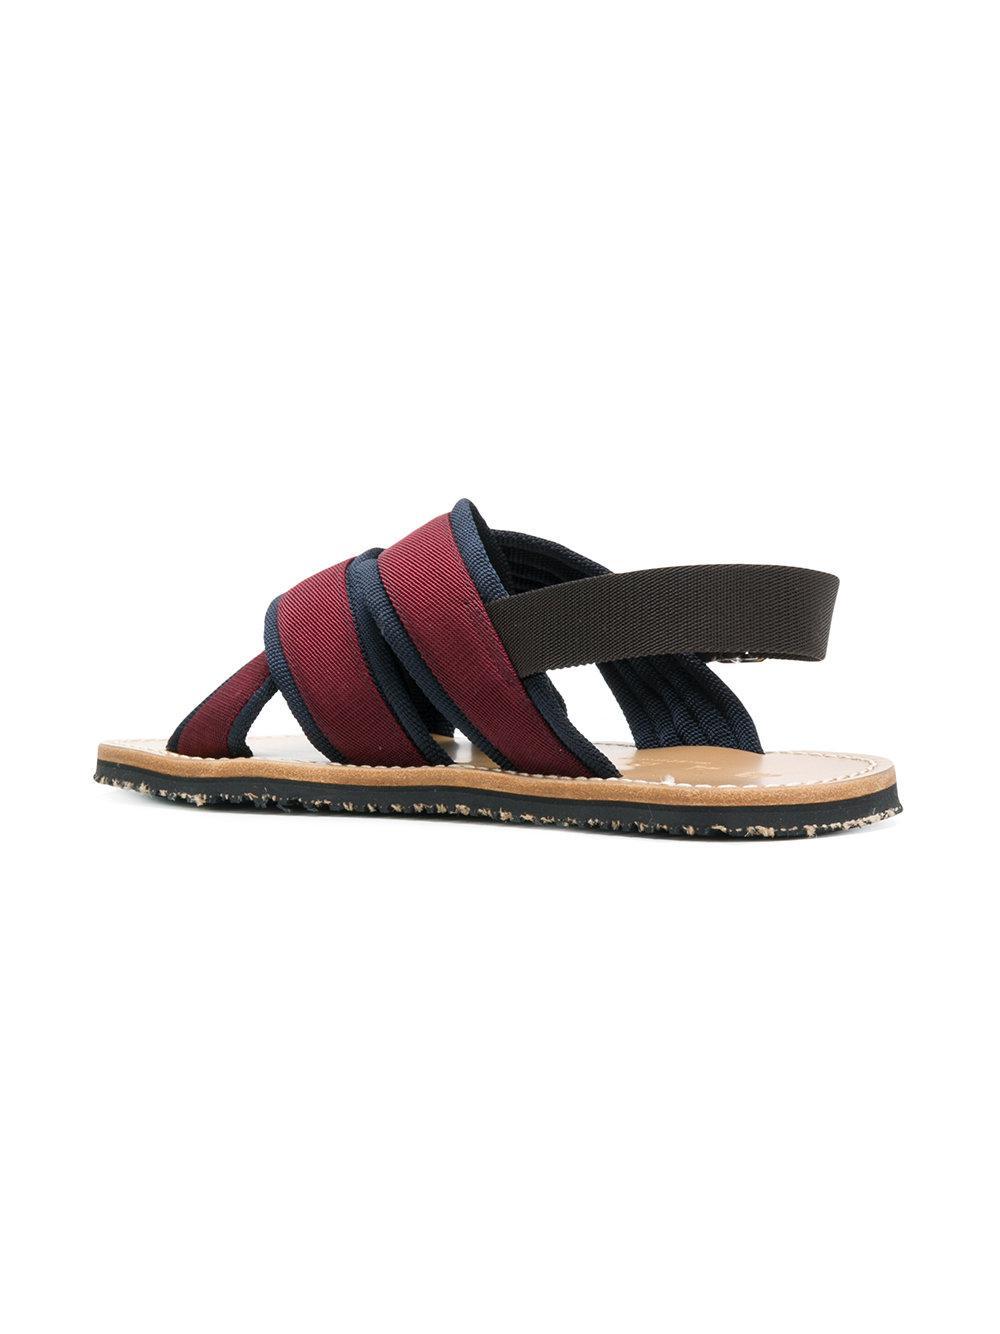 Agnolo sandals - Brown Marni kVa1AejP